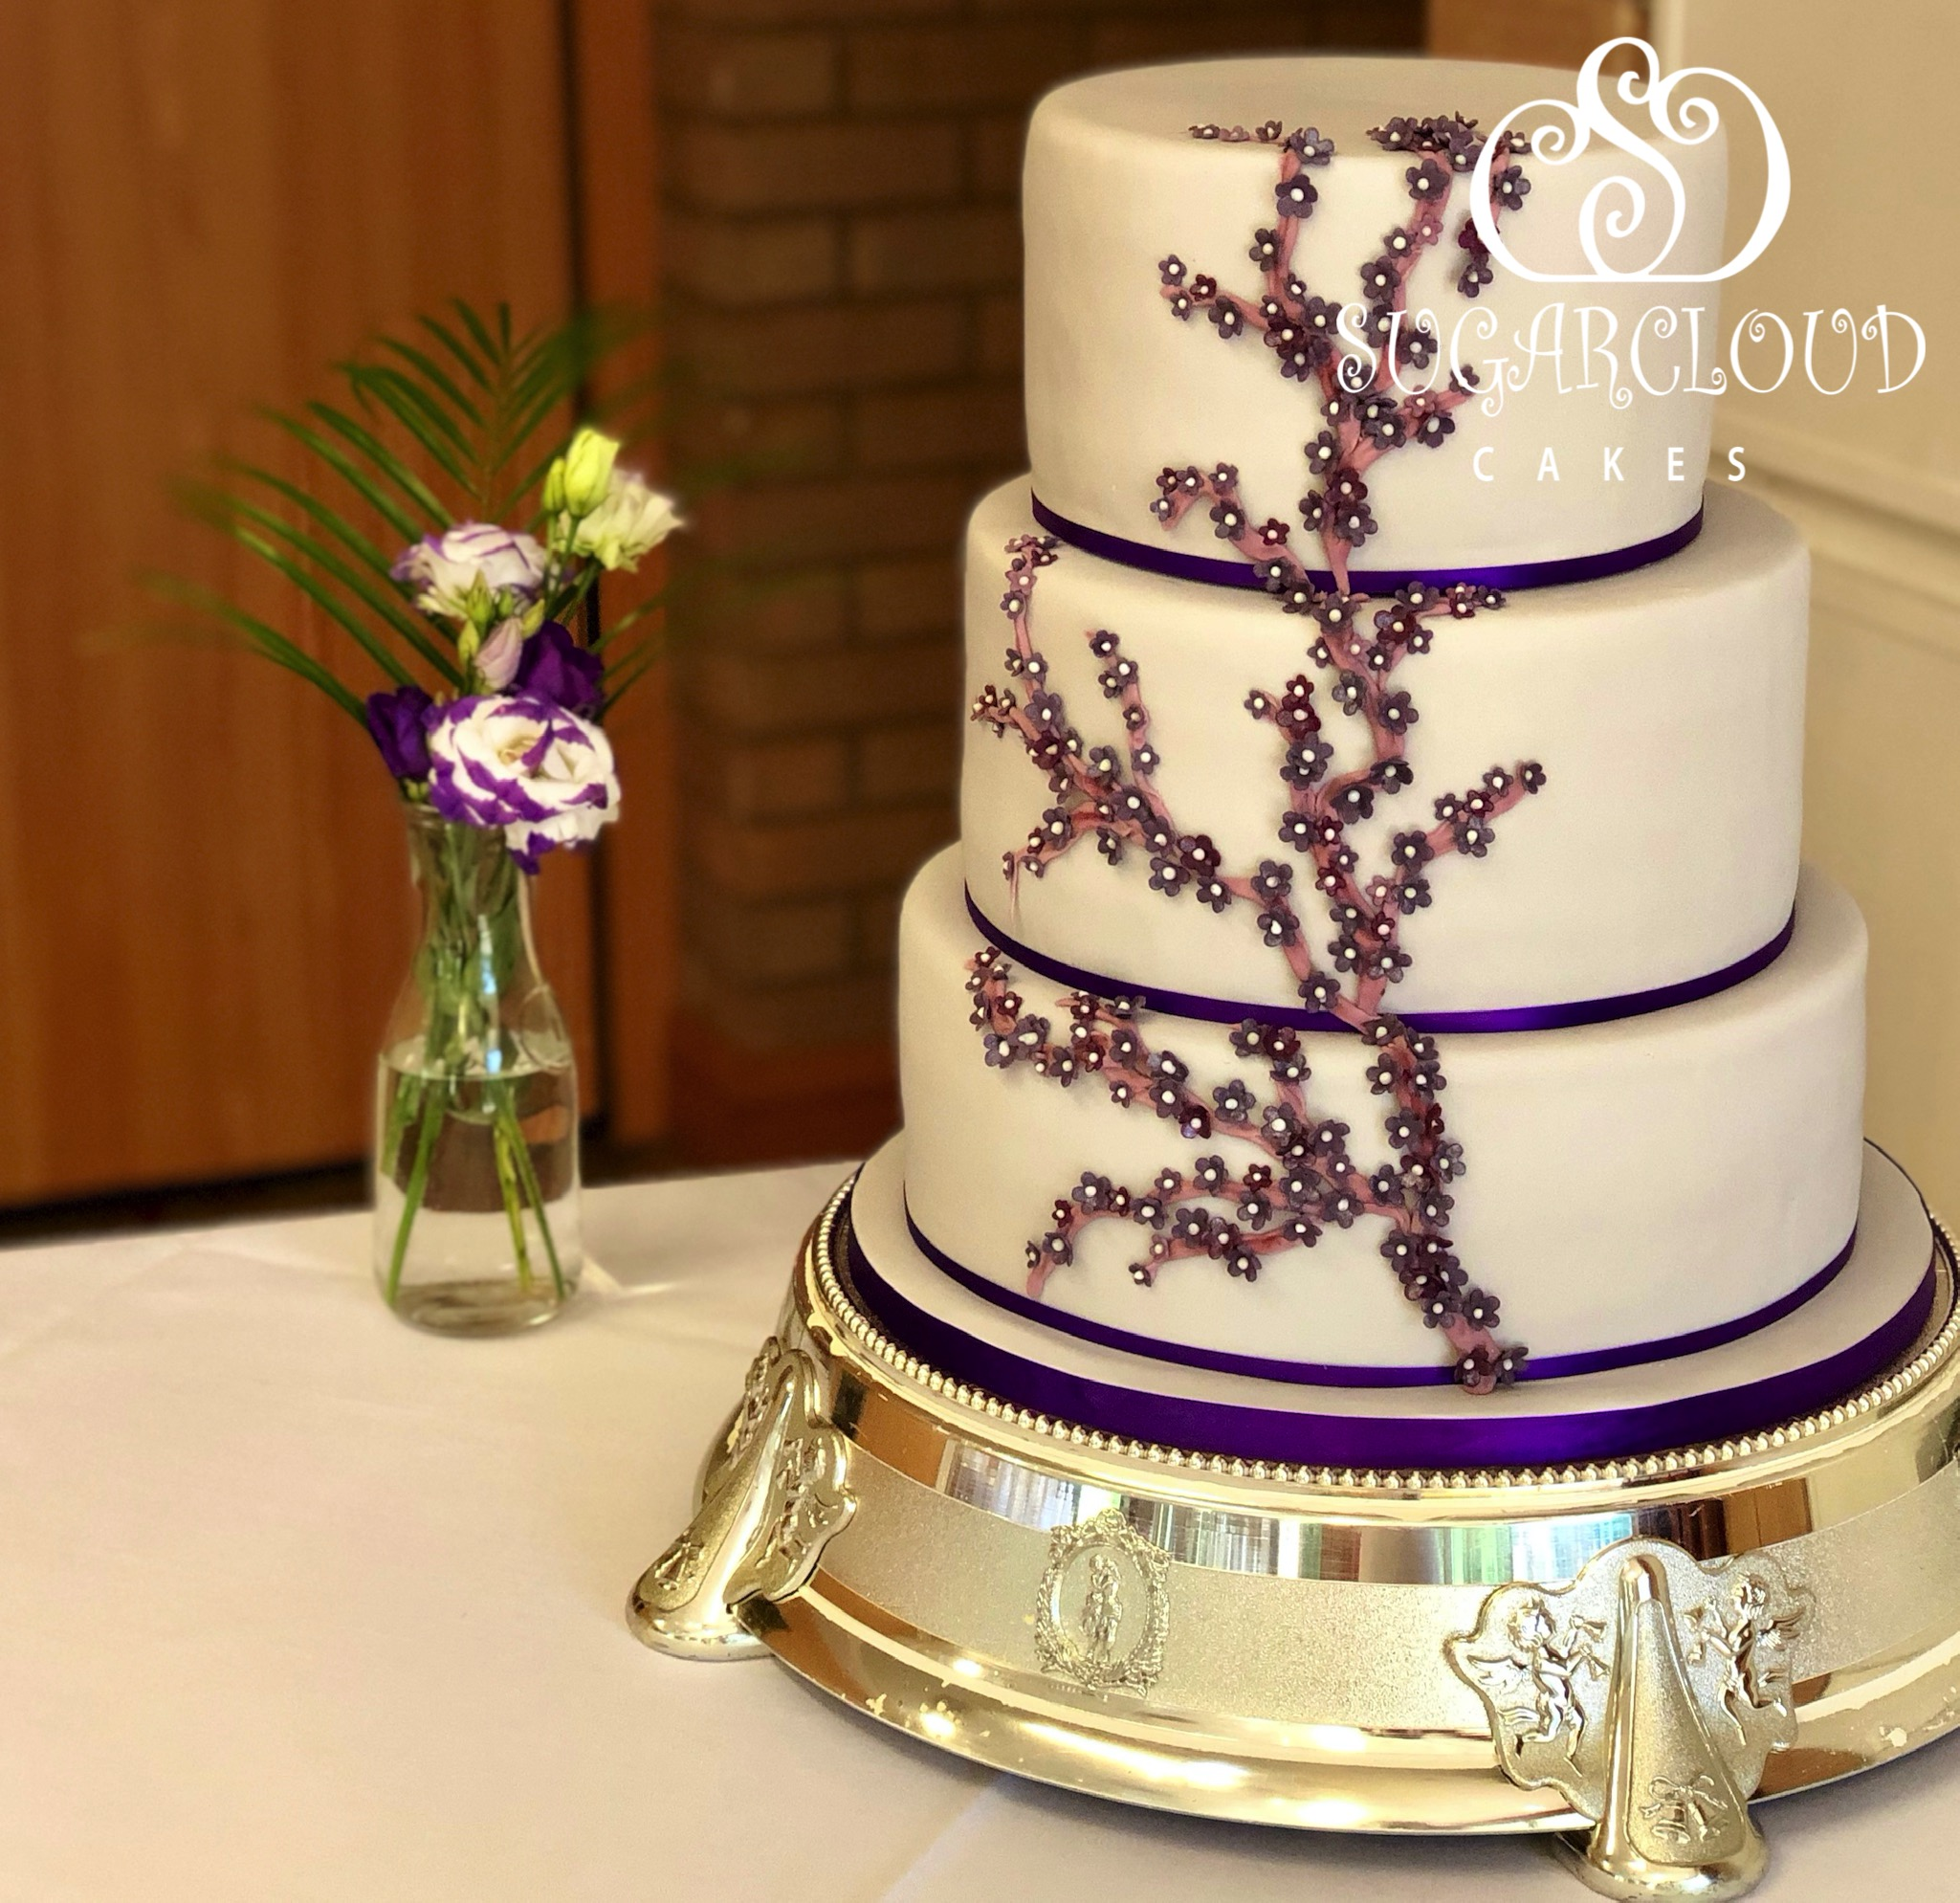 Nicola and Martin's Purple and Grey Wedding Cake